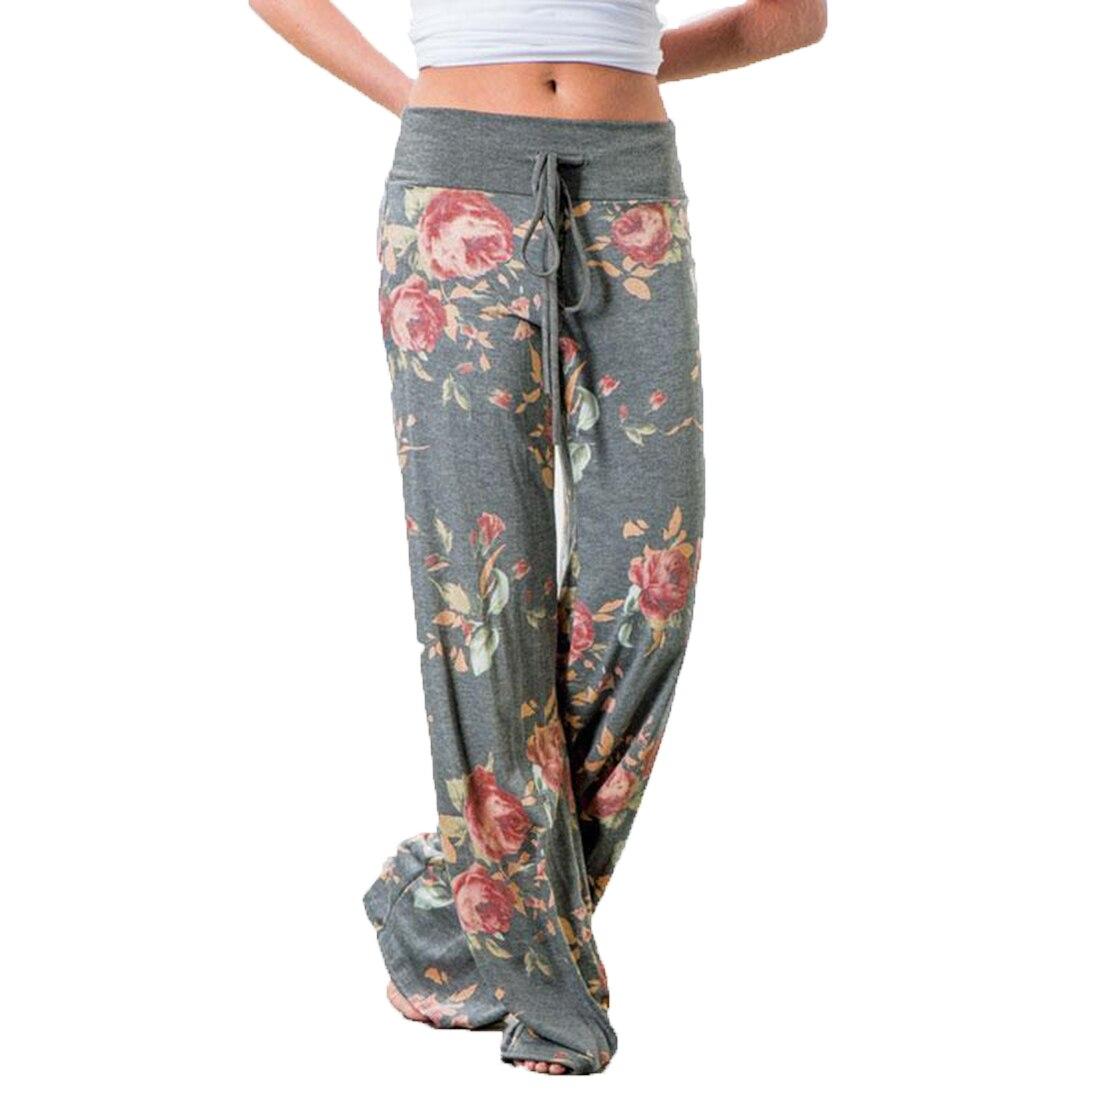 Cool Fashion Jeans Womens Slim High Waist Elastic Skinny Denim Long Pencil Pants LSA | EBay